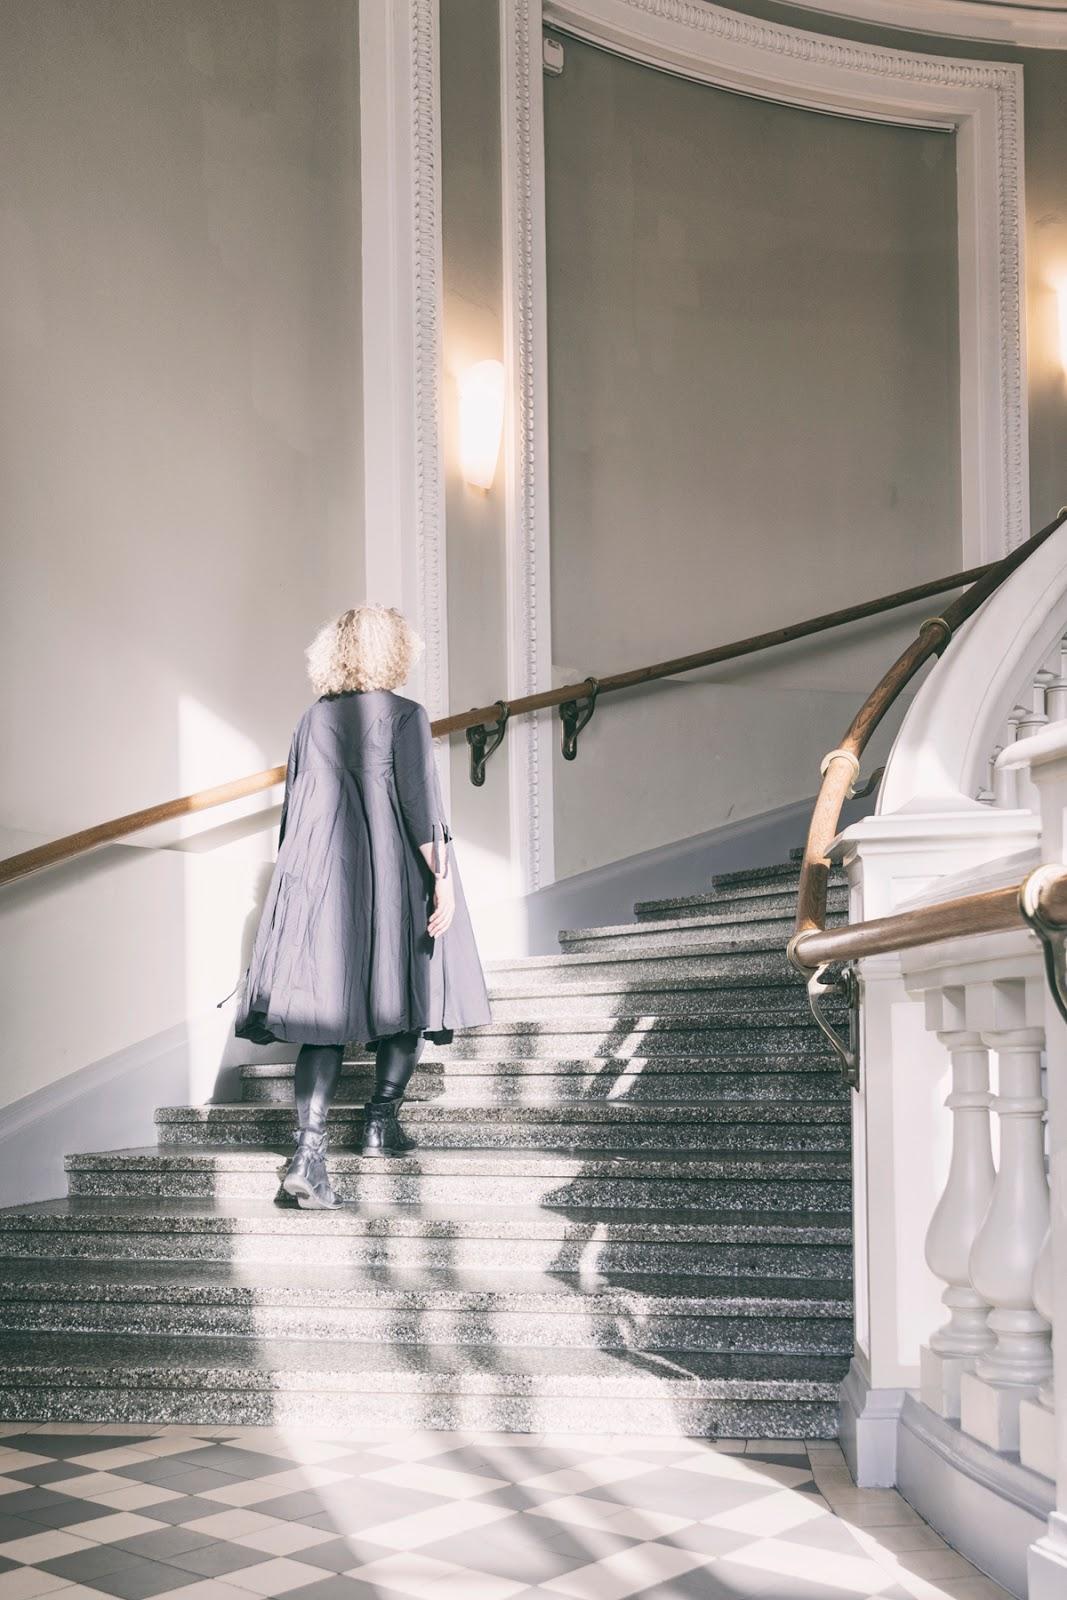 Ewa i Walla, Wynnelis, ladies fashion, clothes, lookbook, naisten muoti, scandinavian design, nordisk, valokuvaaja, Frida Steiner, Visualaddictfrida, Visualaddict, Frida Steiner, Luonnontieteellinen museo, Museum, Helsinki